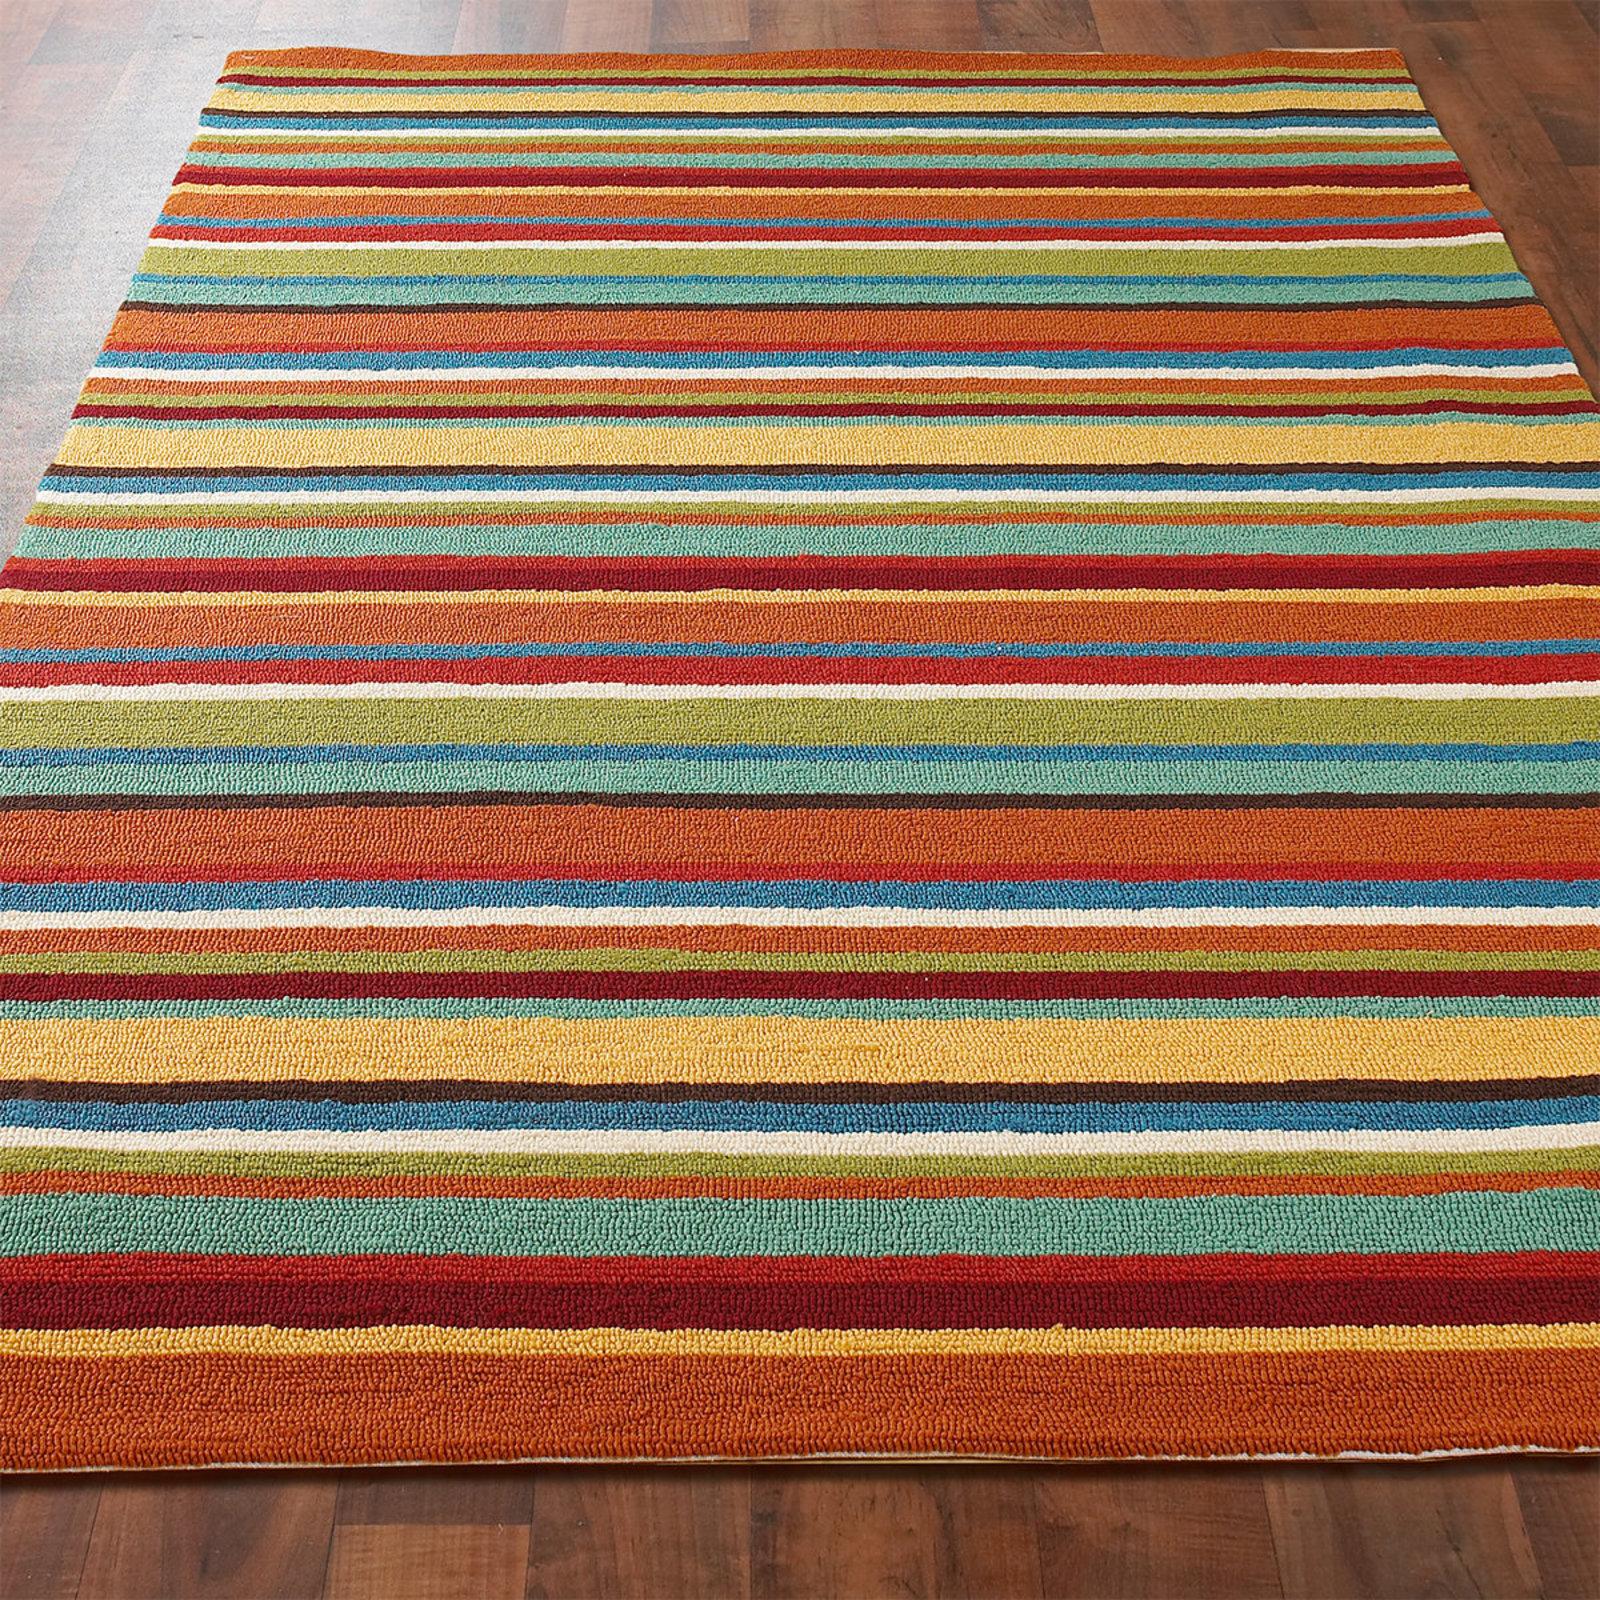 colorful rugs colorful stripes hooks indoor outdoor carpet multi QMJXXCO